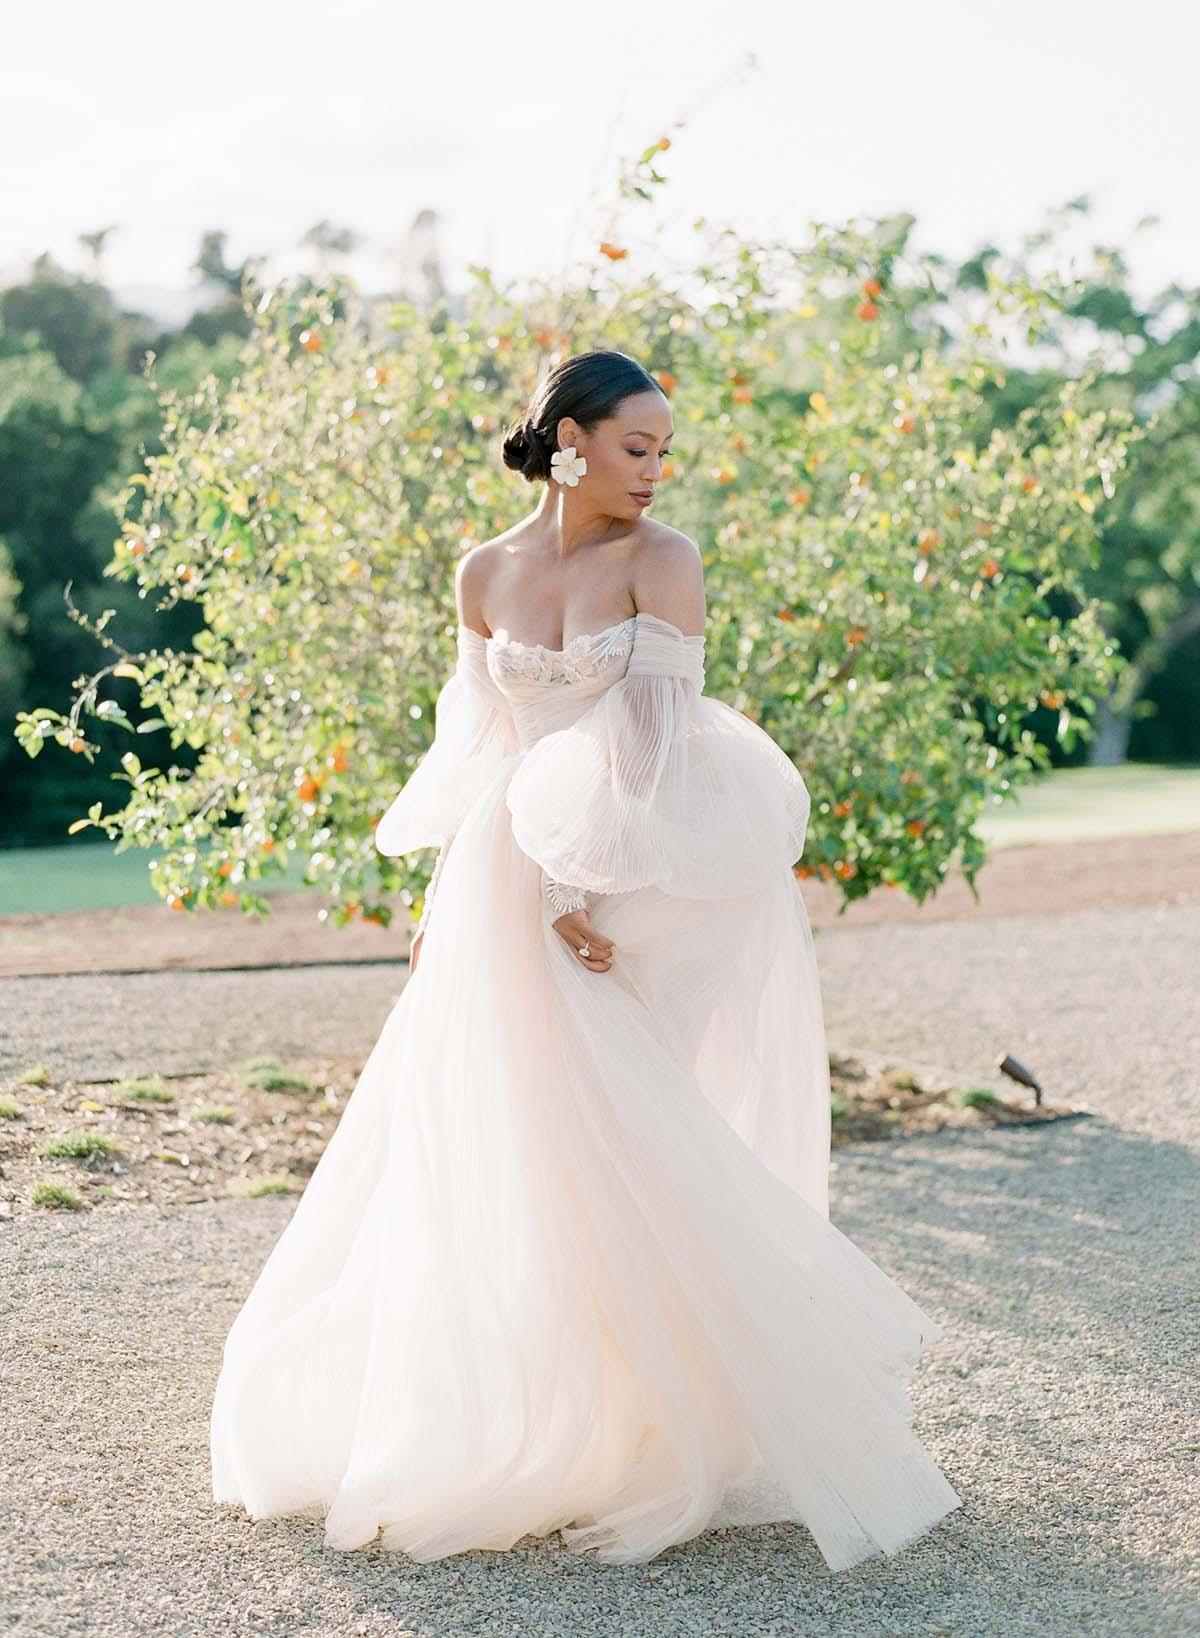 XOXO_BRIDE_Events-Michelle-Beller_Photography_0102